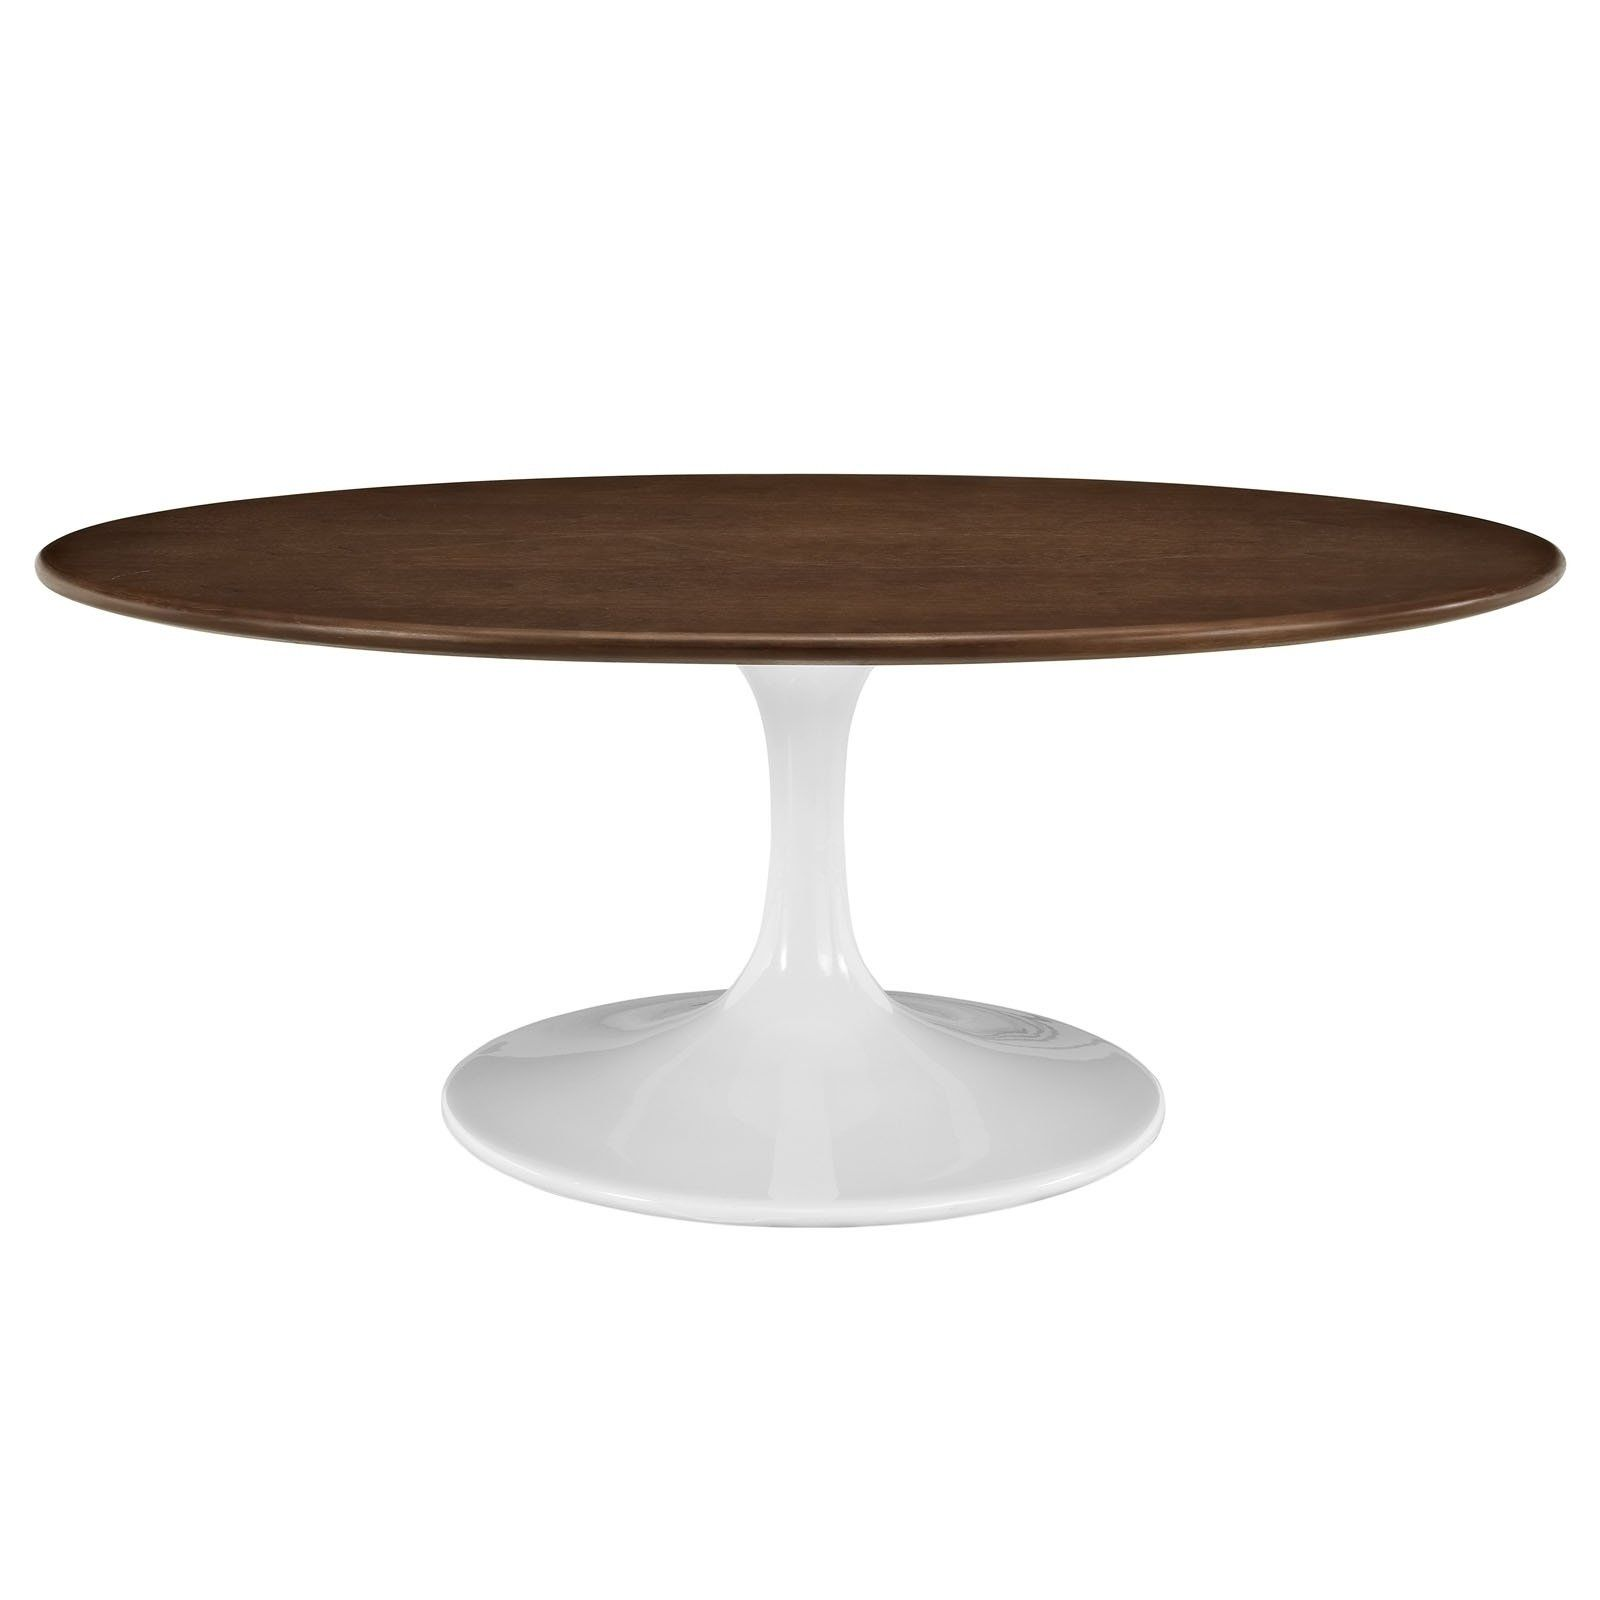 "Oval Tulip Coffee Table: Saarinen 42"" Oval Tulip Coffee Table Wood"